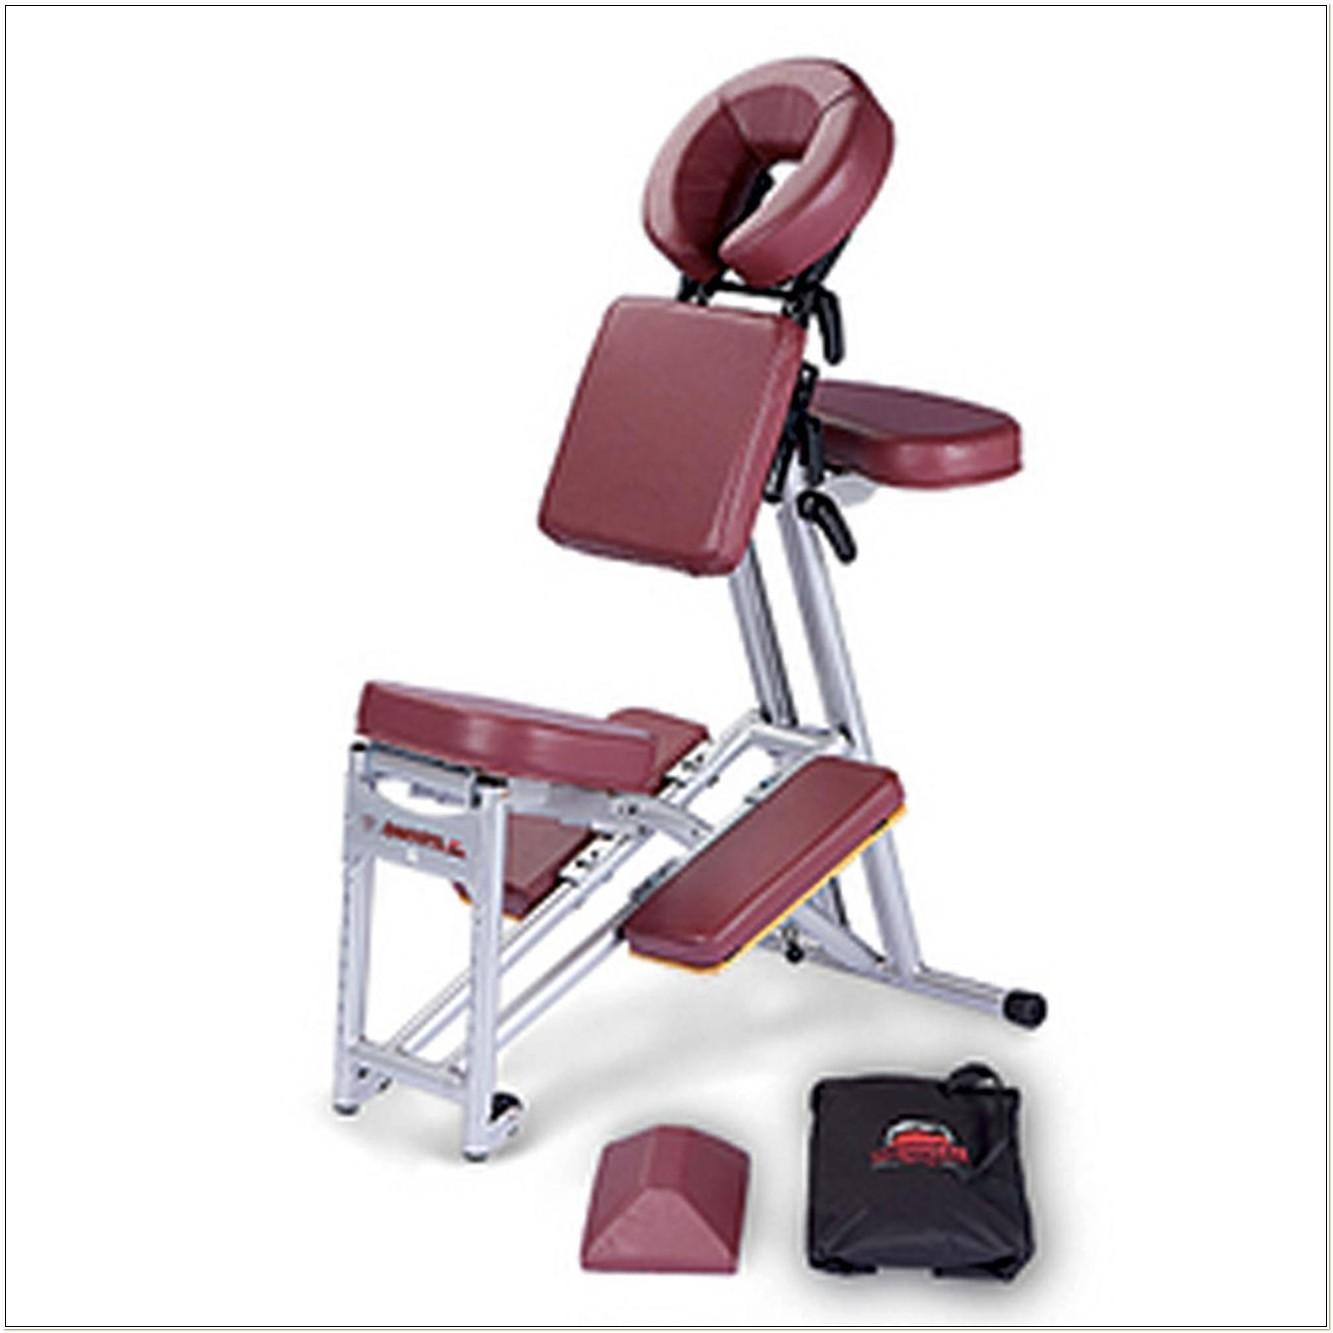 Portal Pro 3 Massage Chair